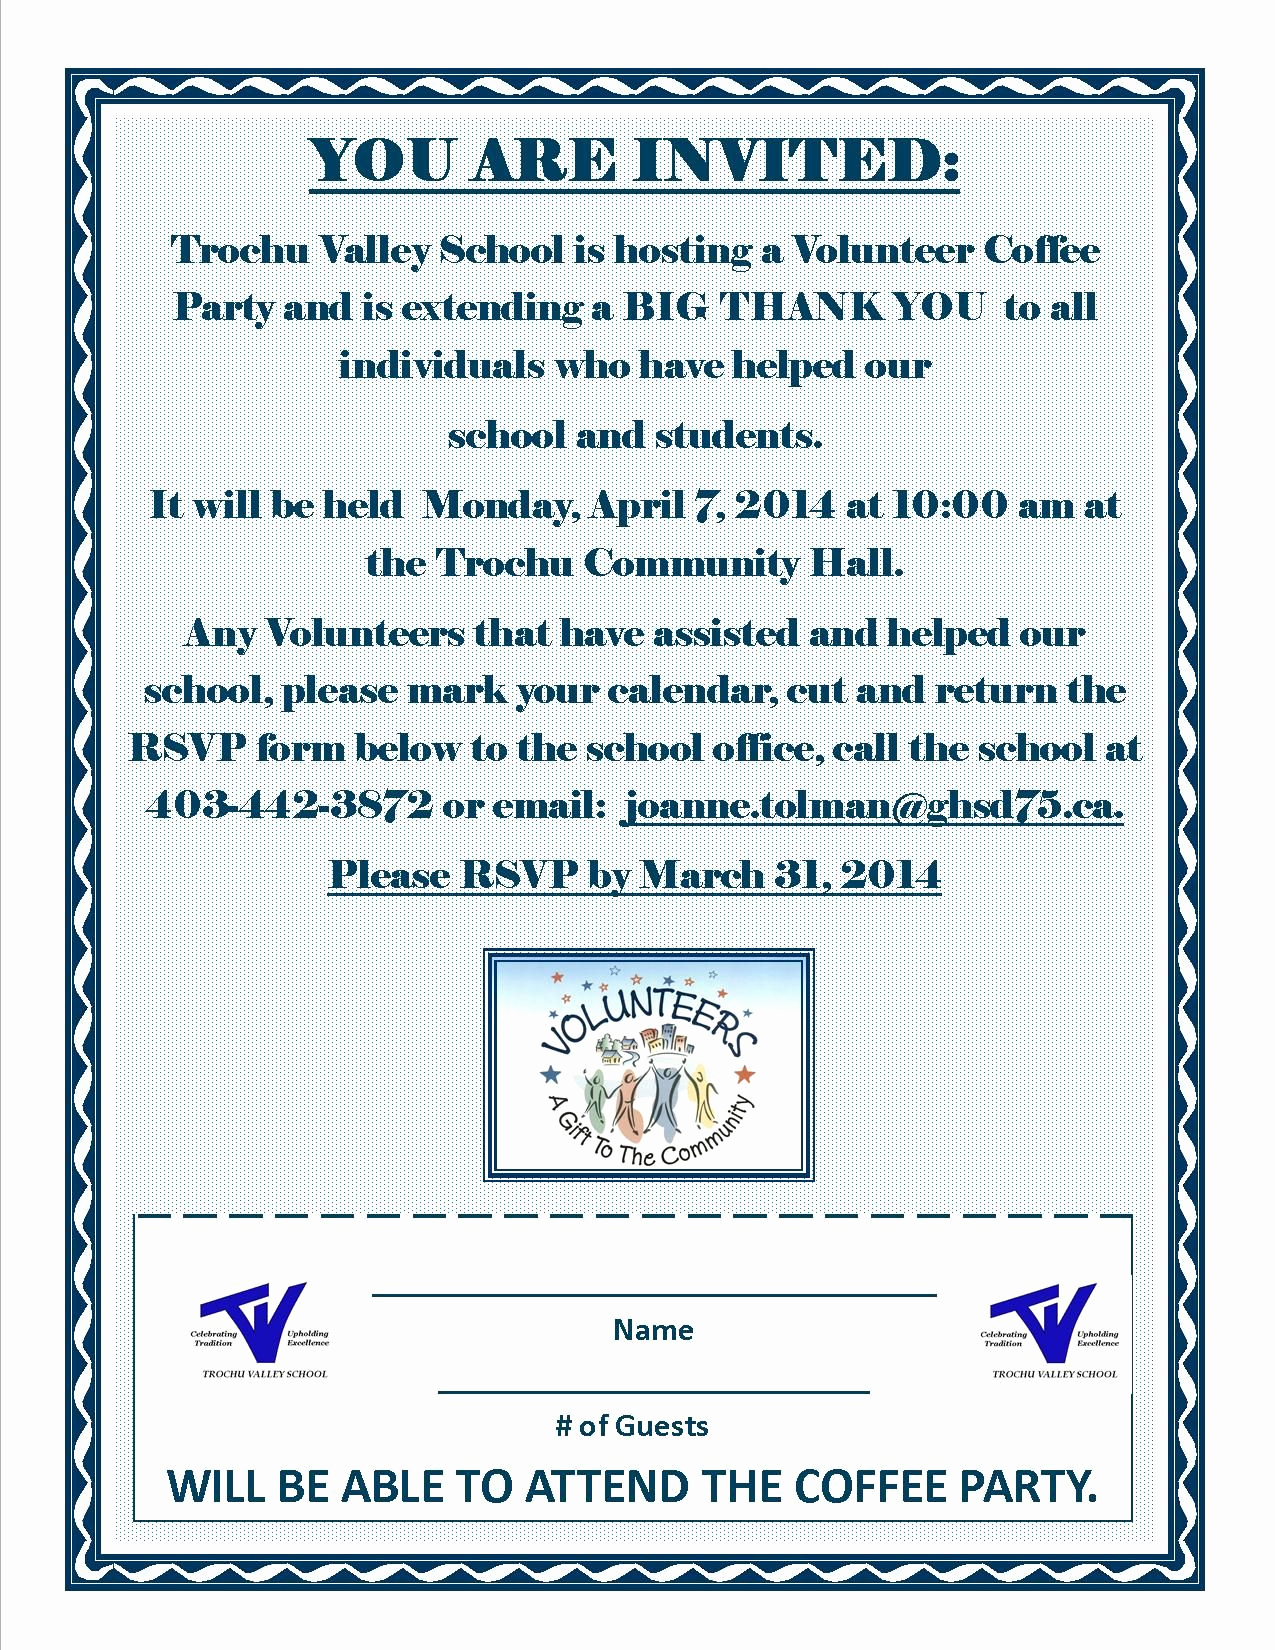 Volunteer Appreciation Invitation Wording Inspirational School Volunteer Appreciation Invitation Volunteer